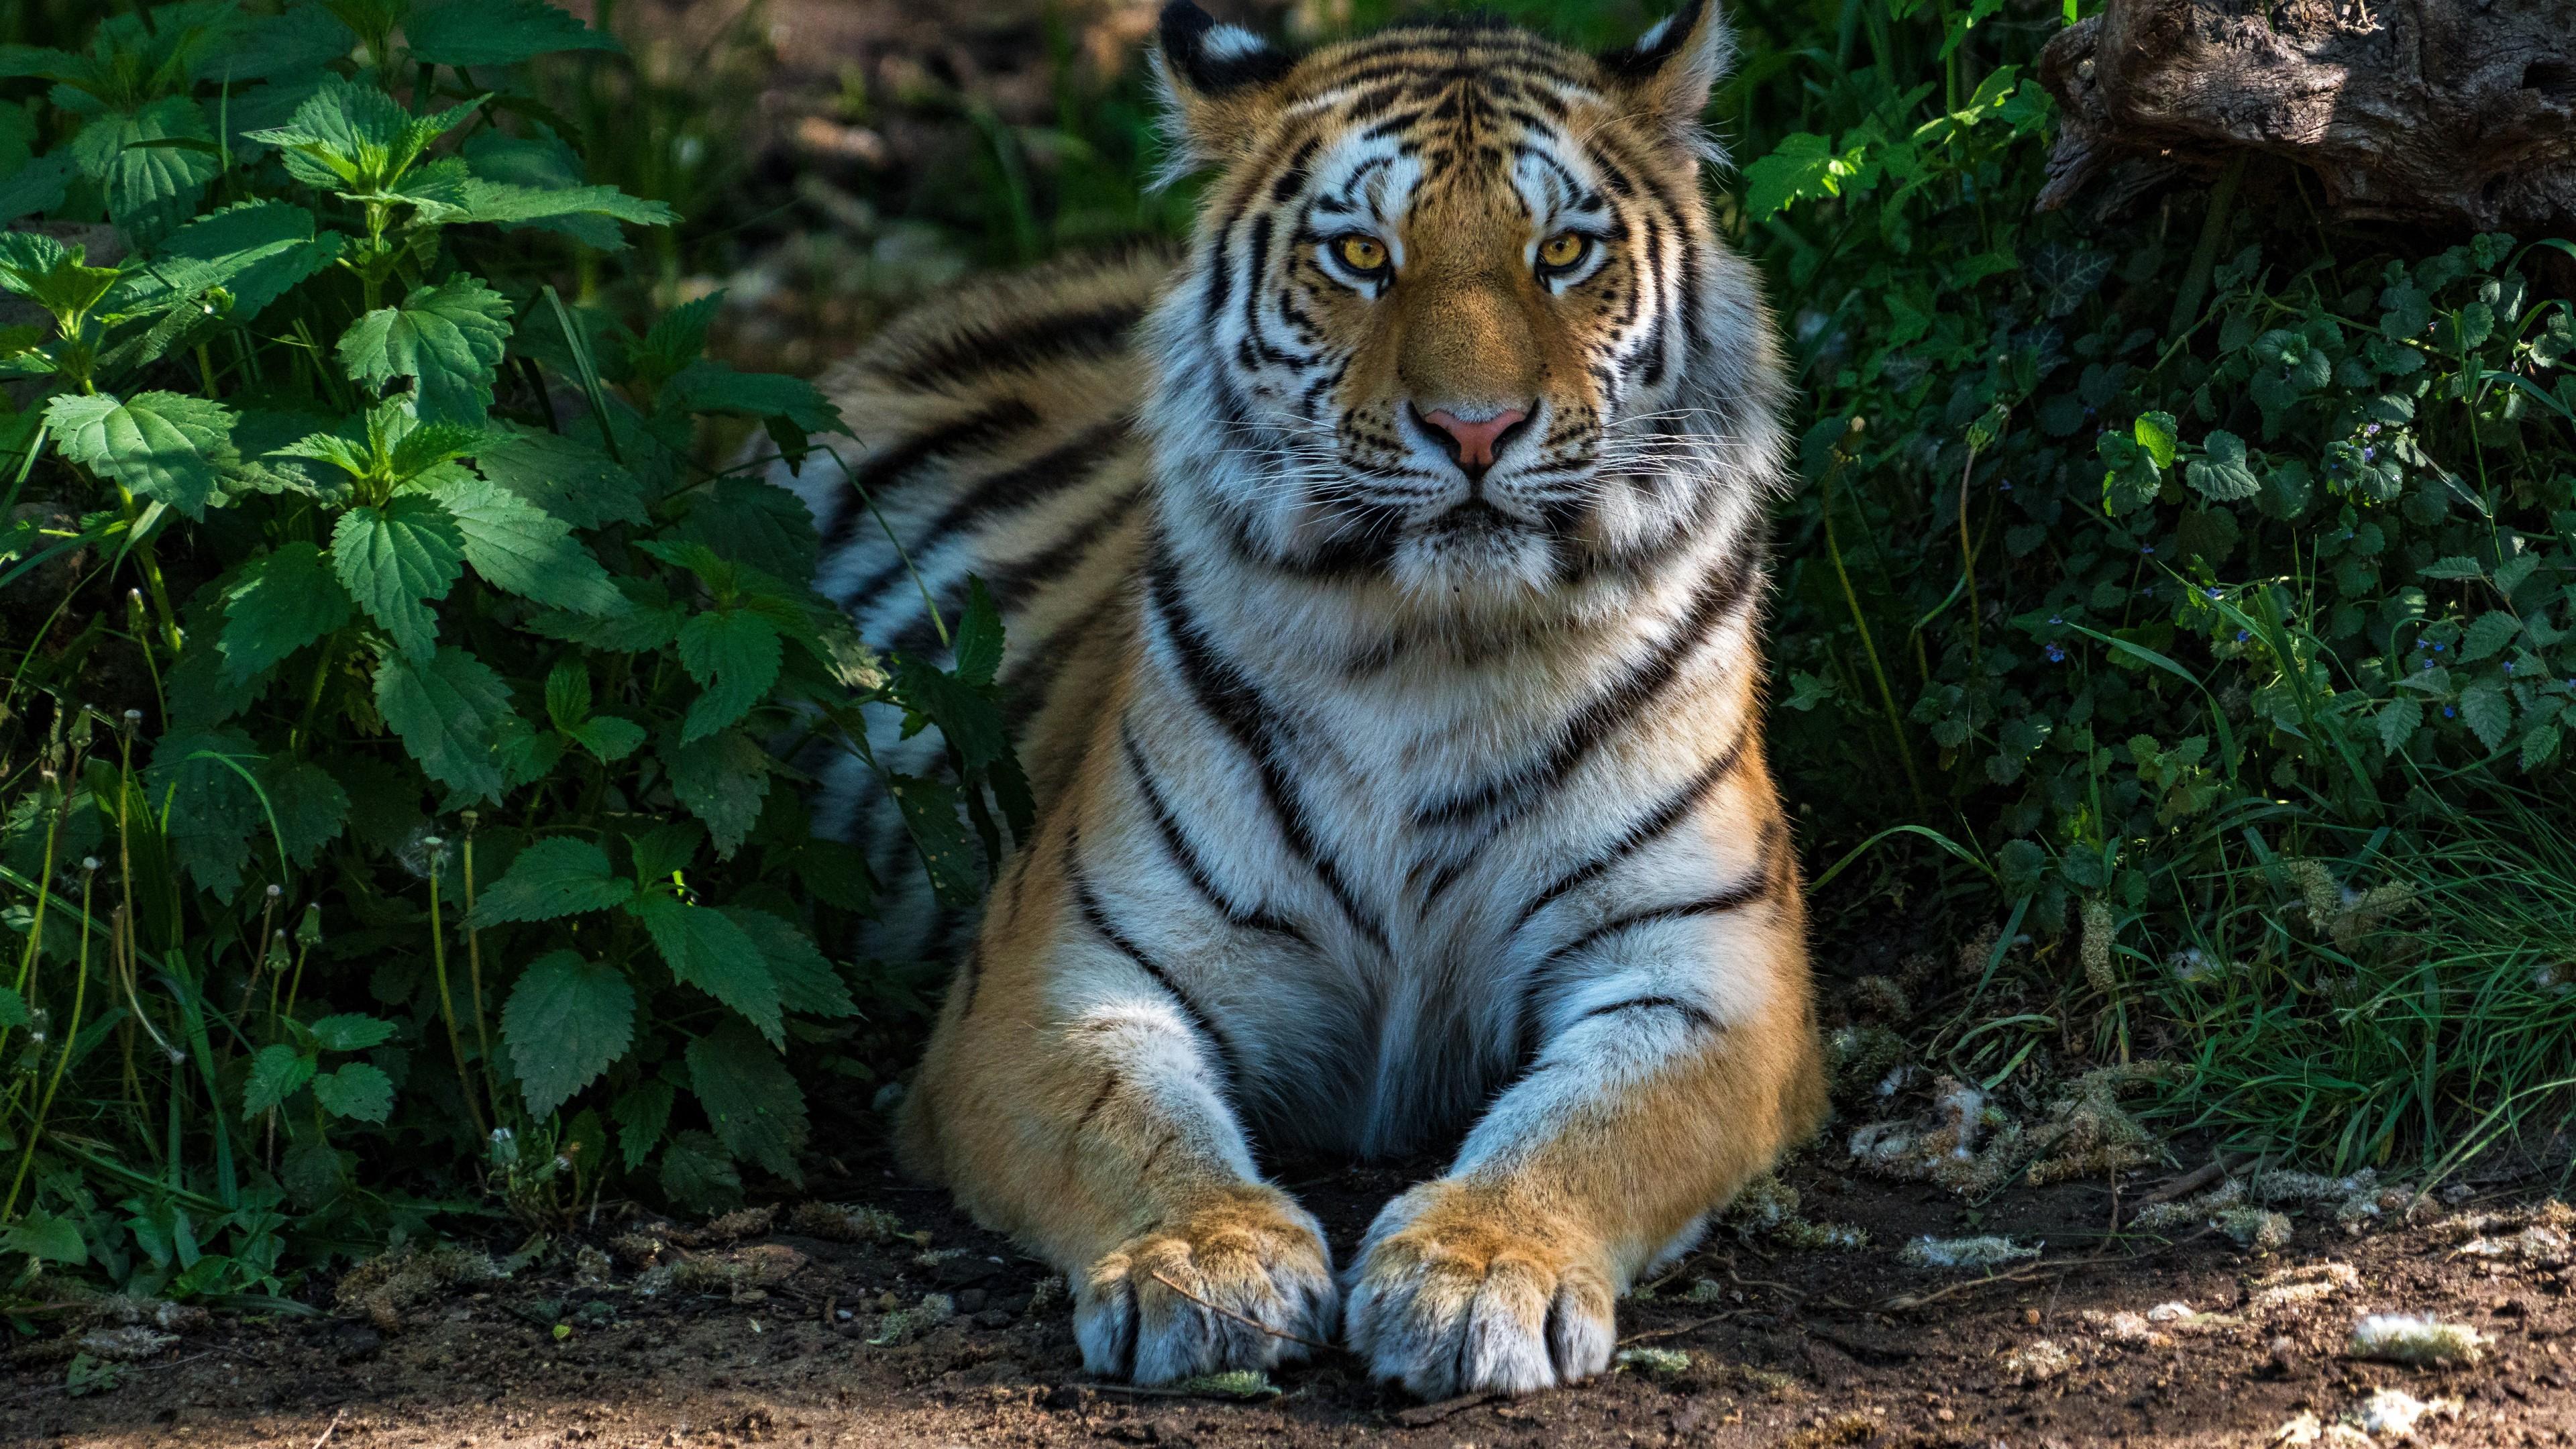 Tiger Desktop Background Photo Download 3840x2160